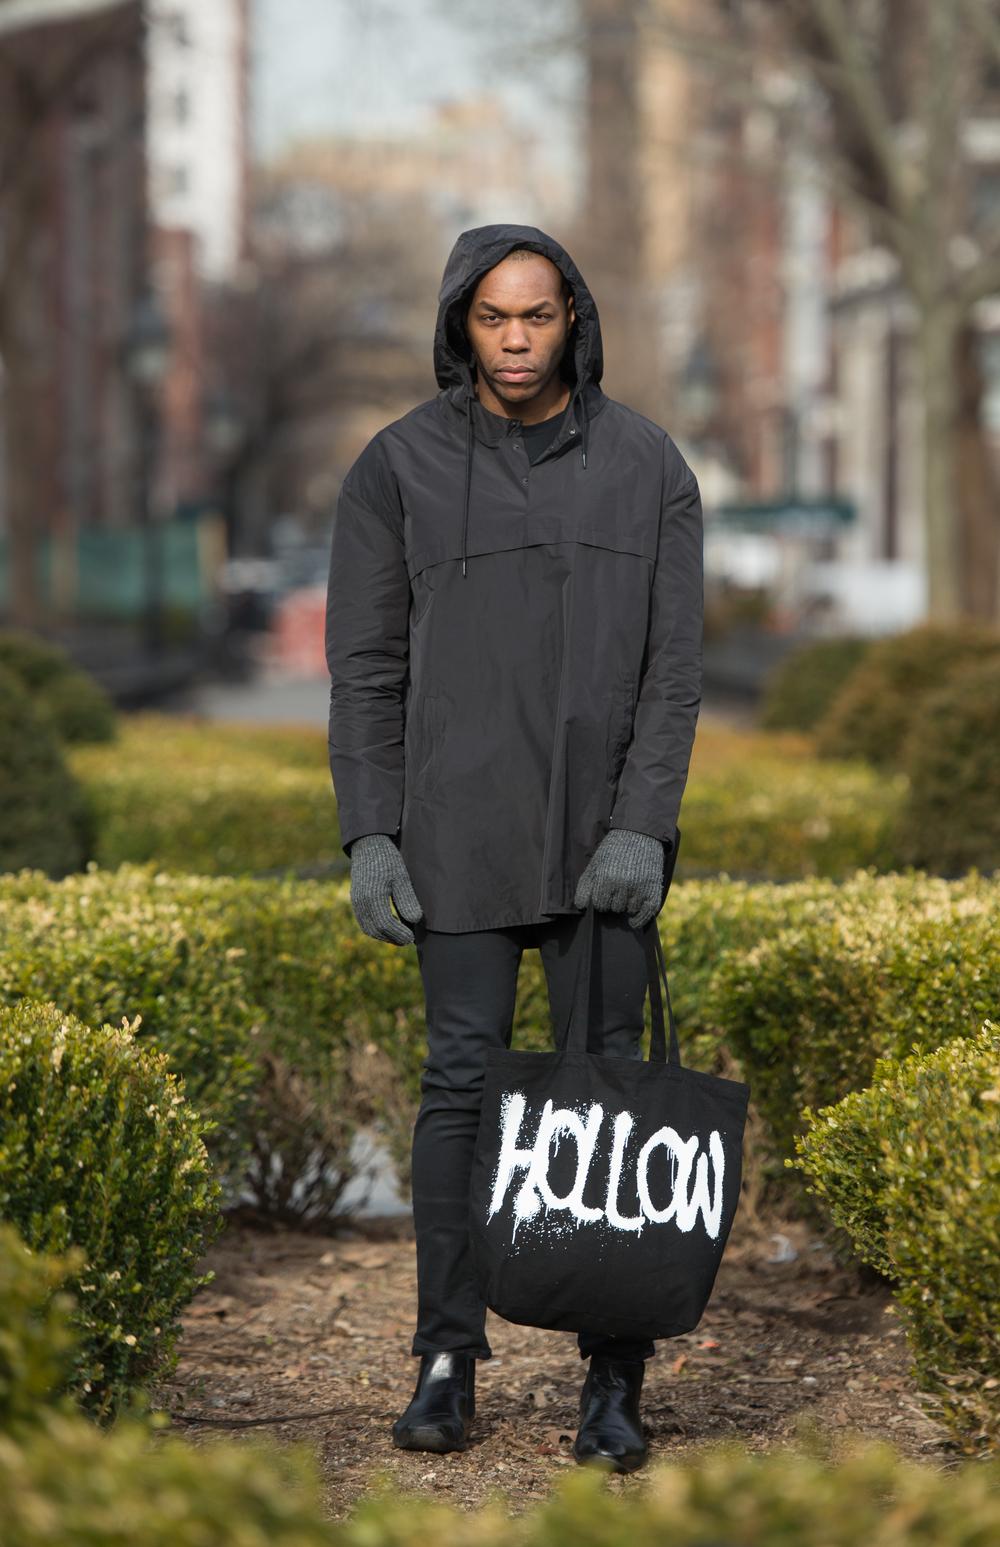 Hollow 2